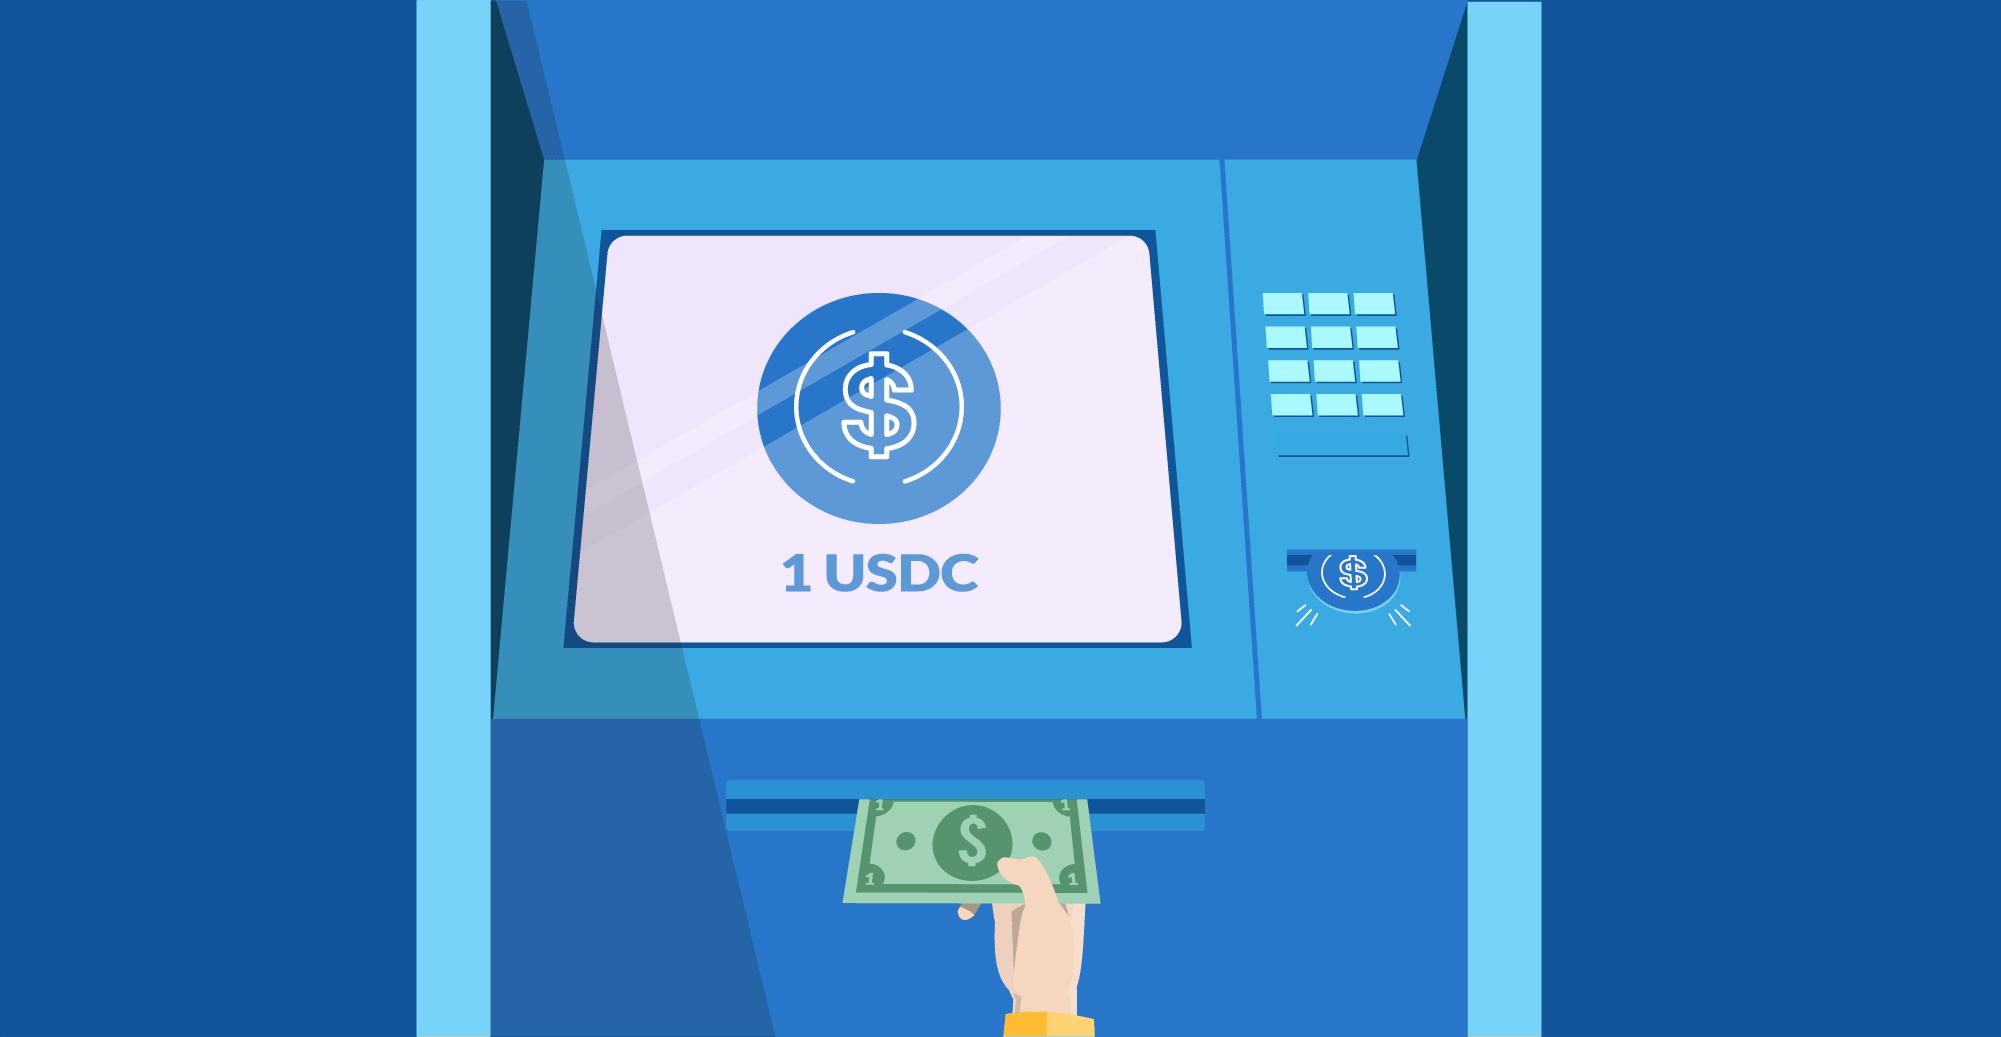 Trocar dólar por USD Coin